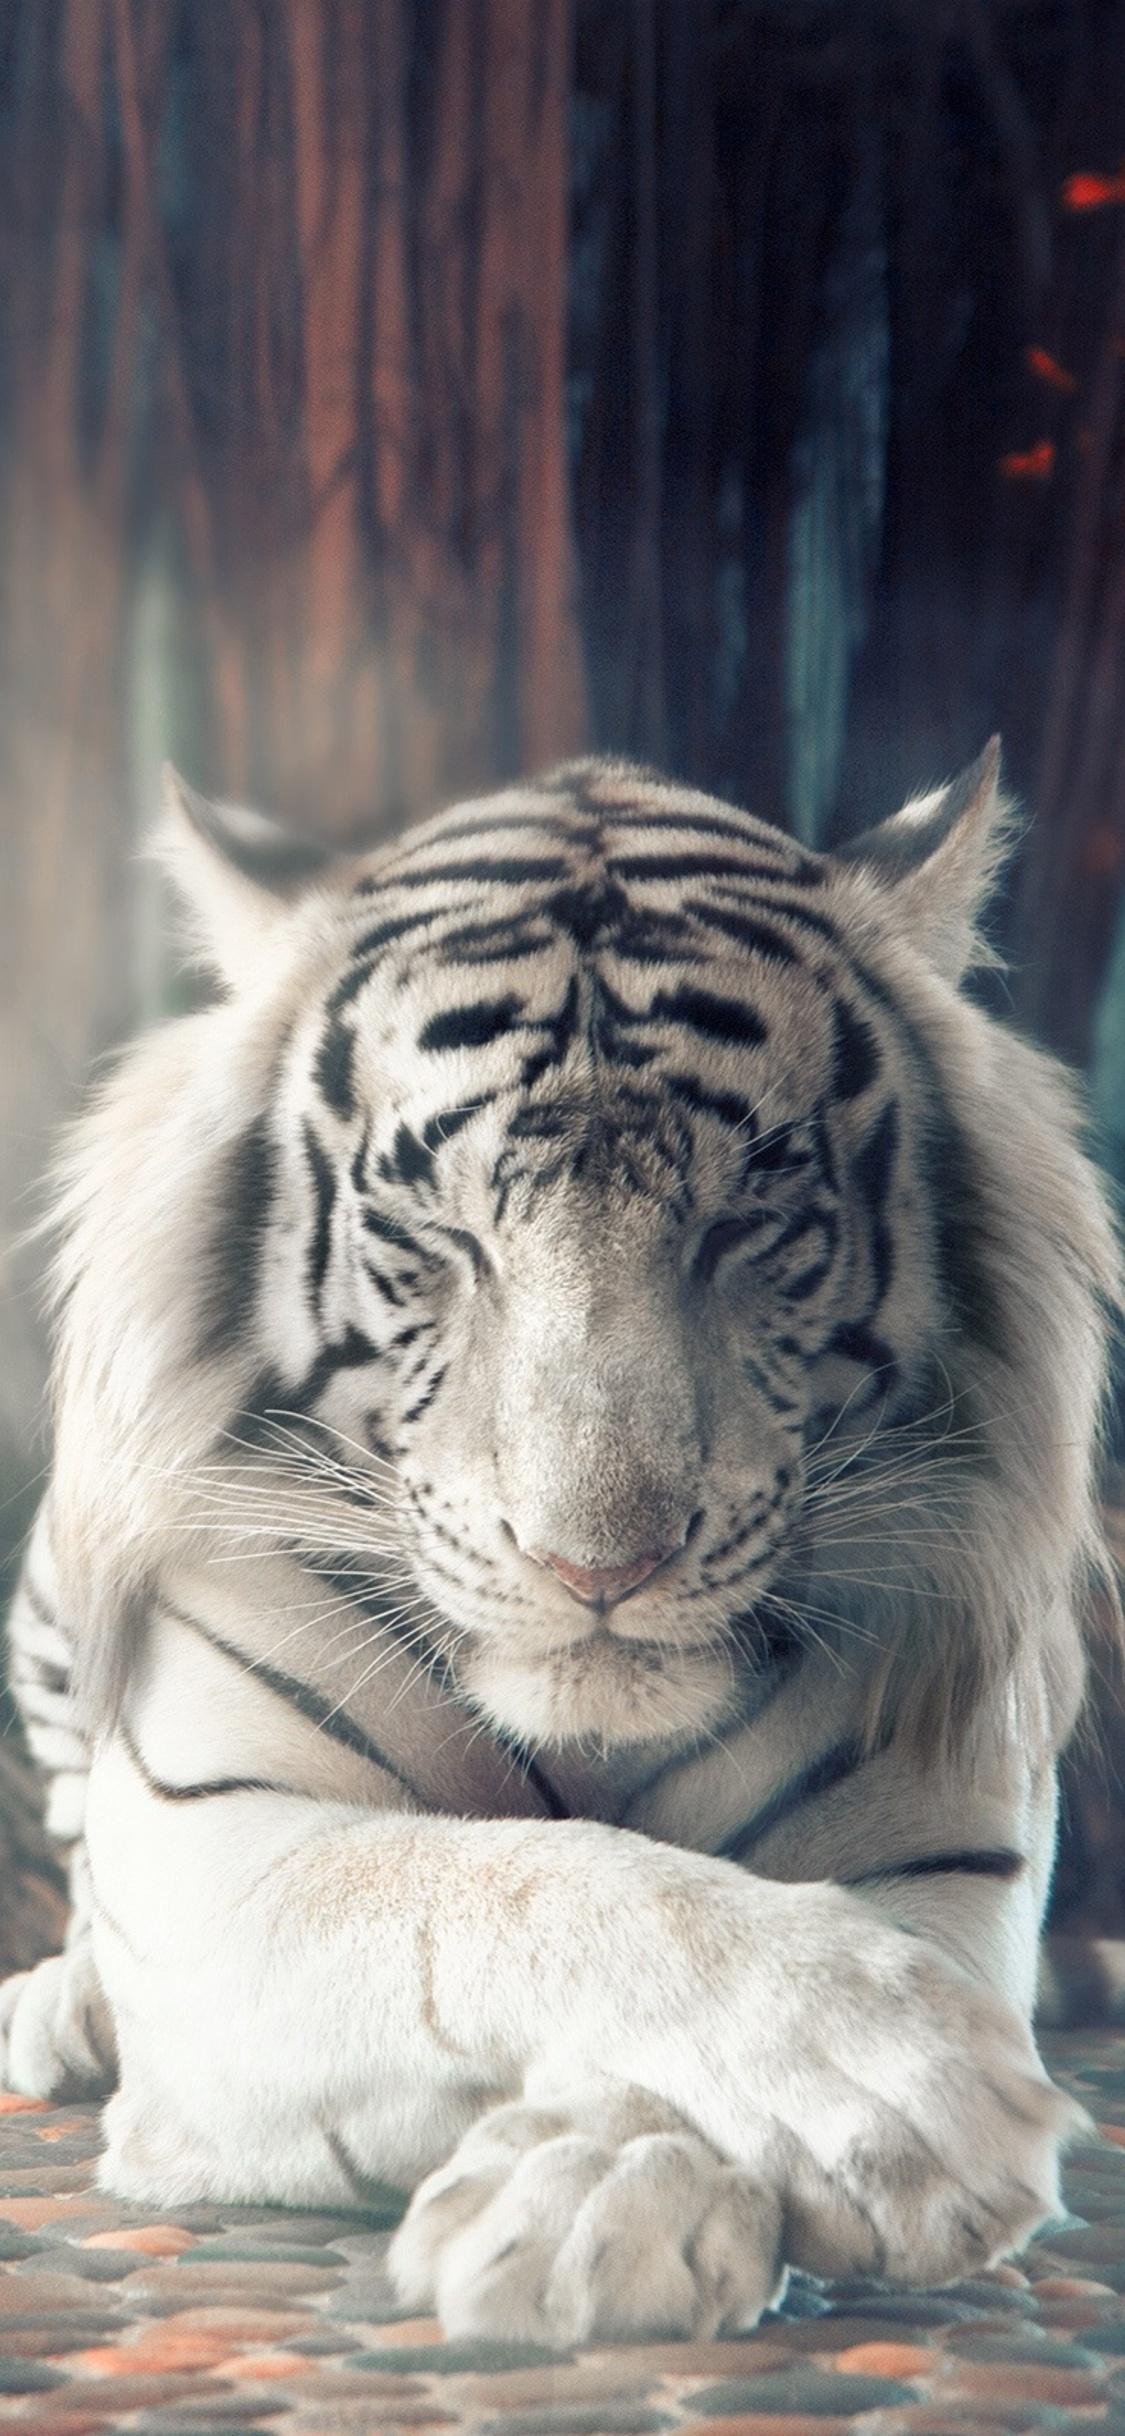 4k Wallpaper Iphone X Wallpaper 4k Tiger